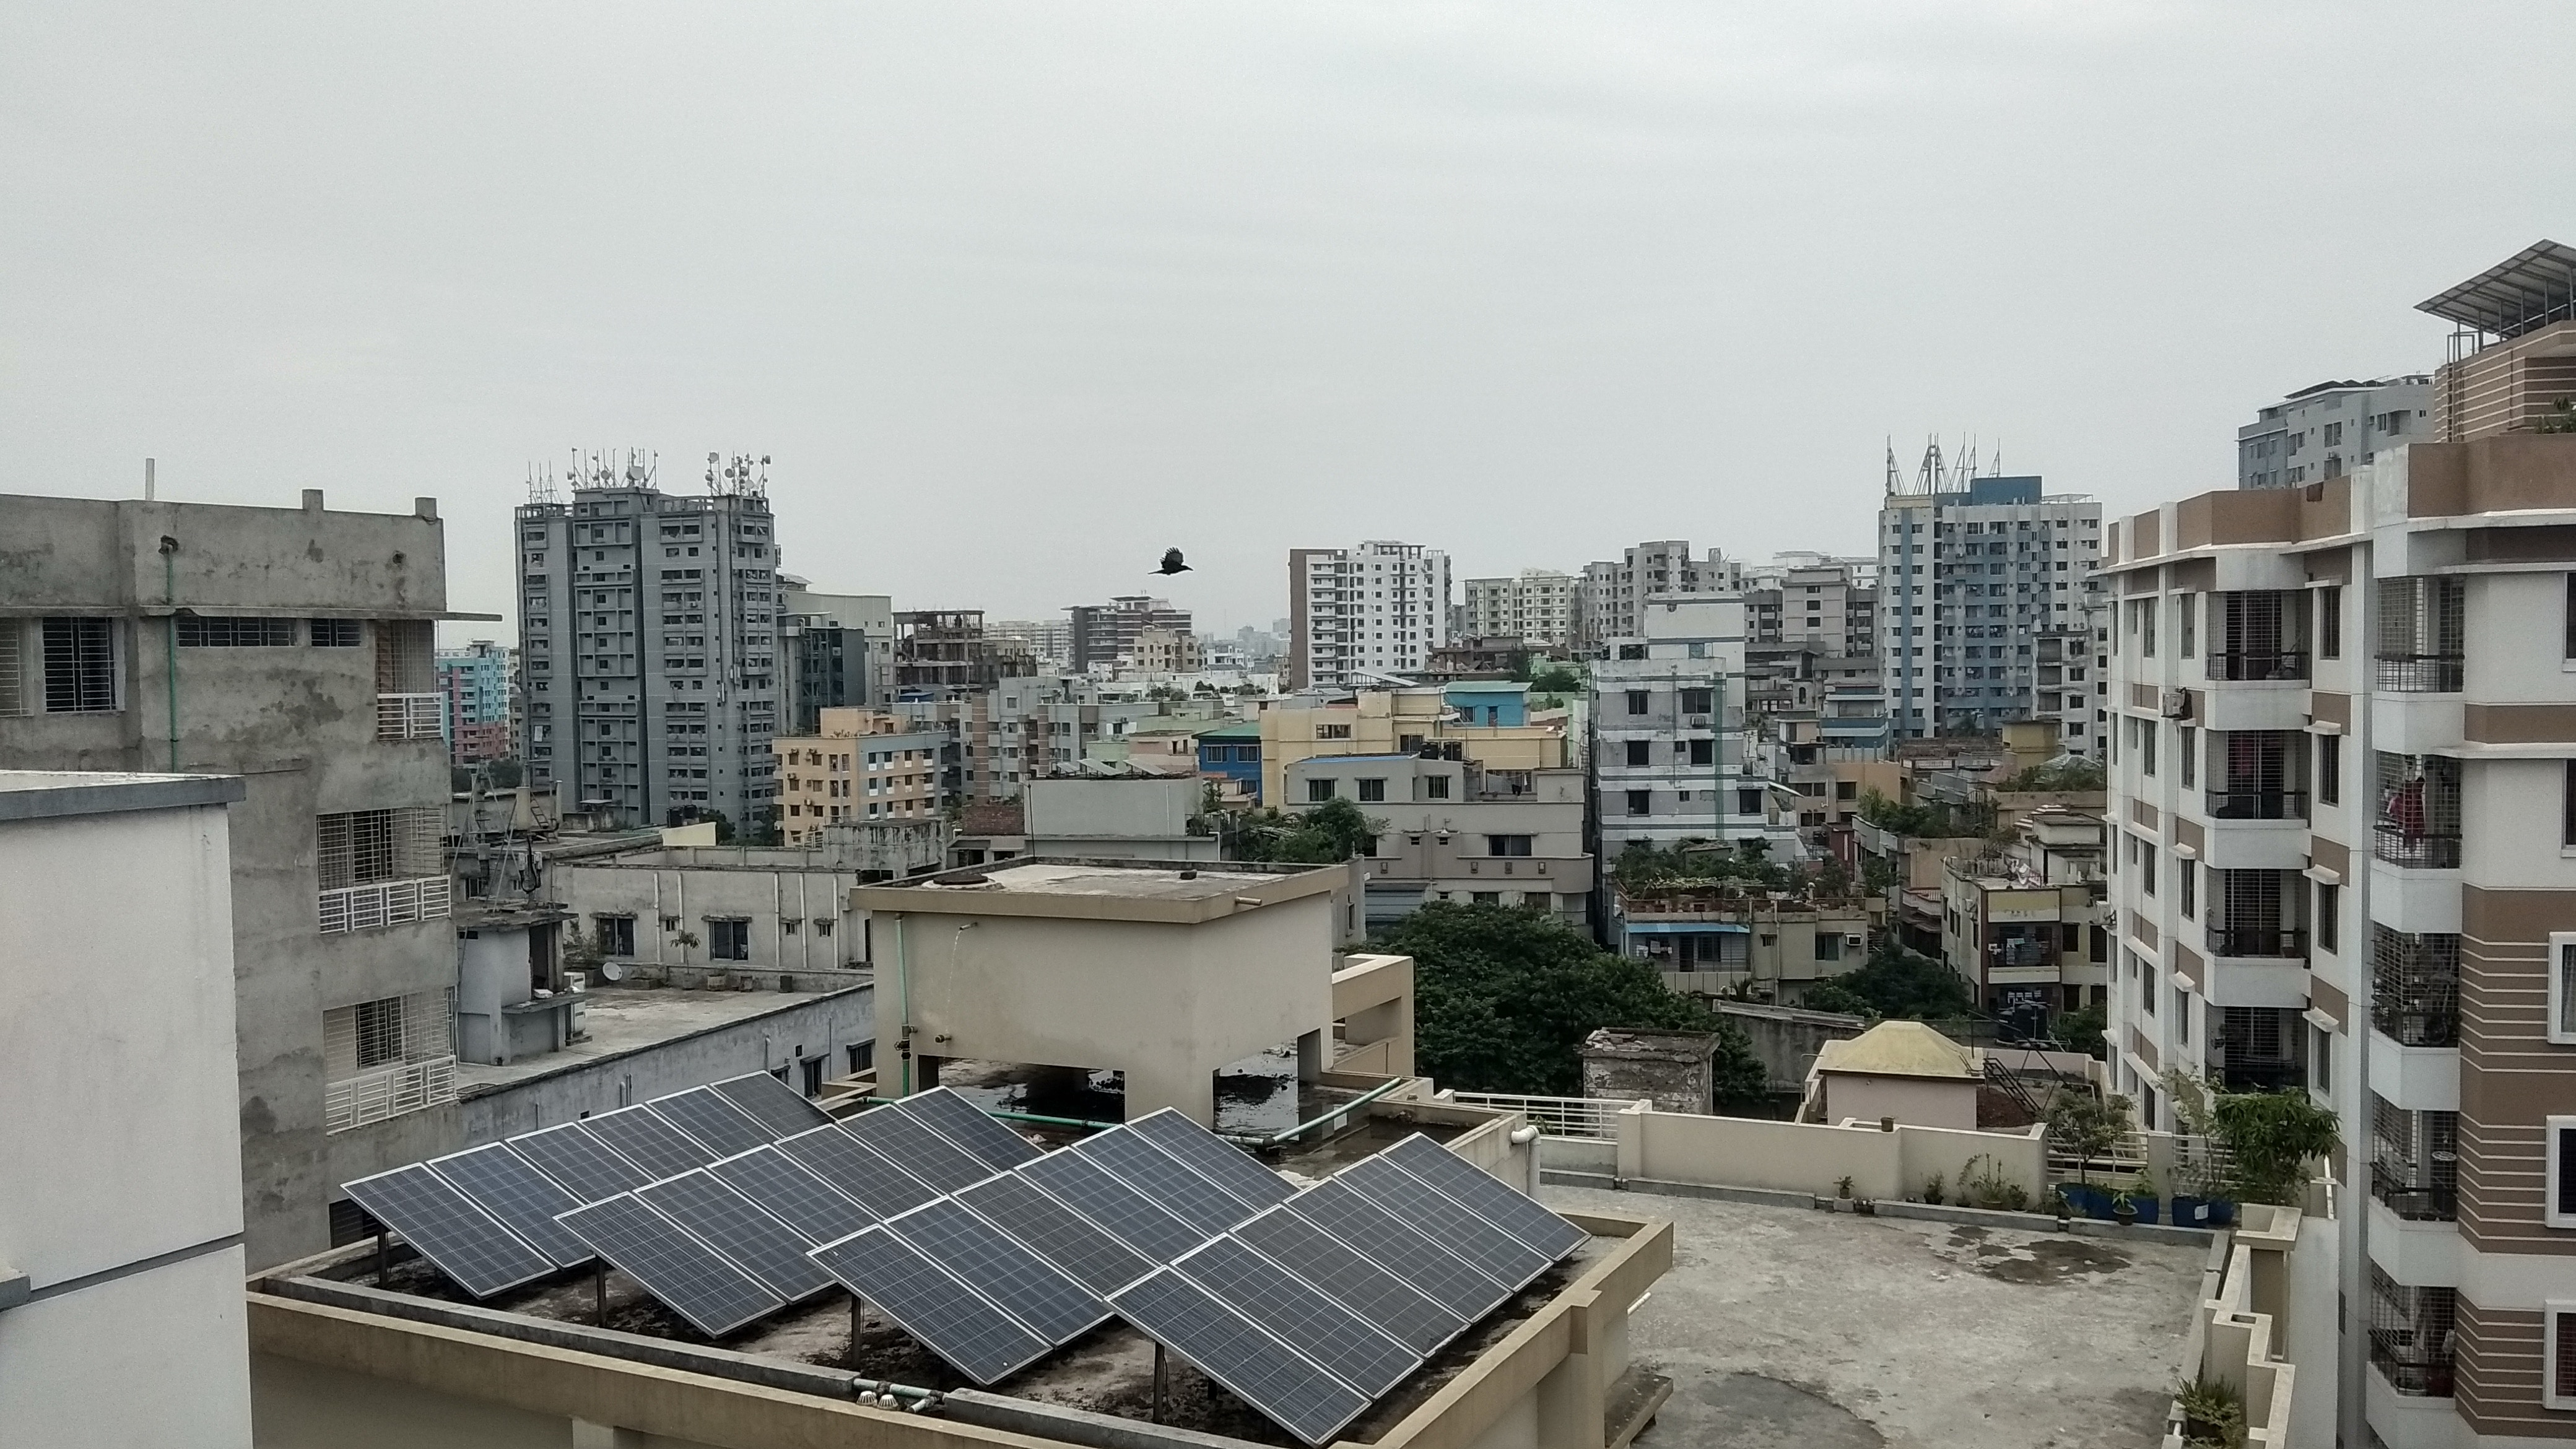 rooftop view of Dhaka, Bangladesh